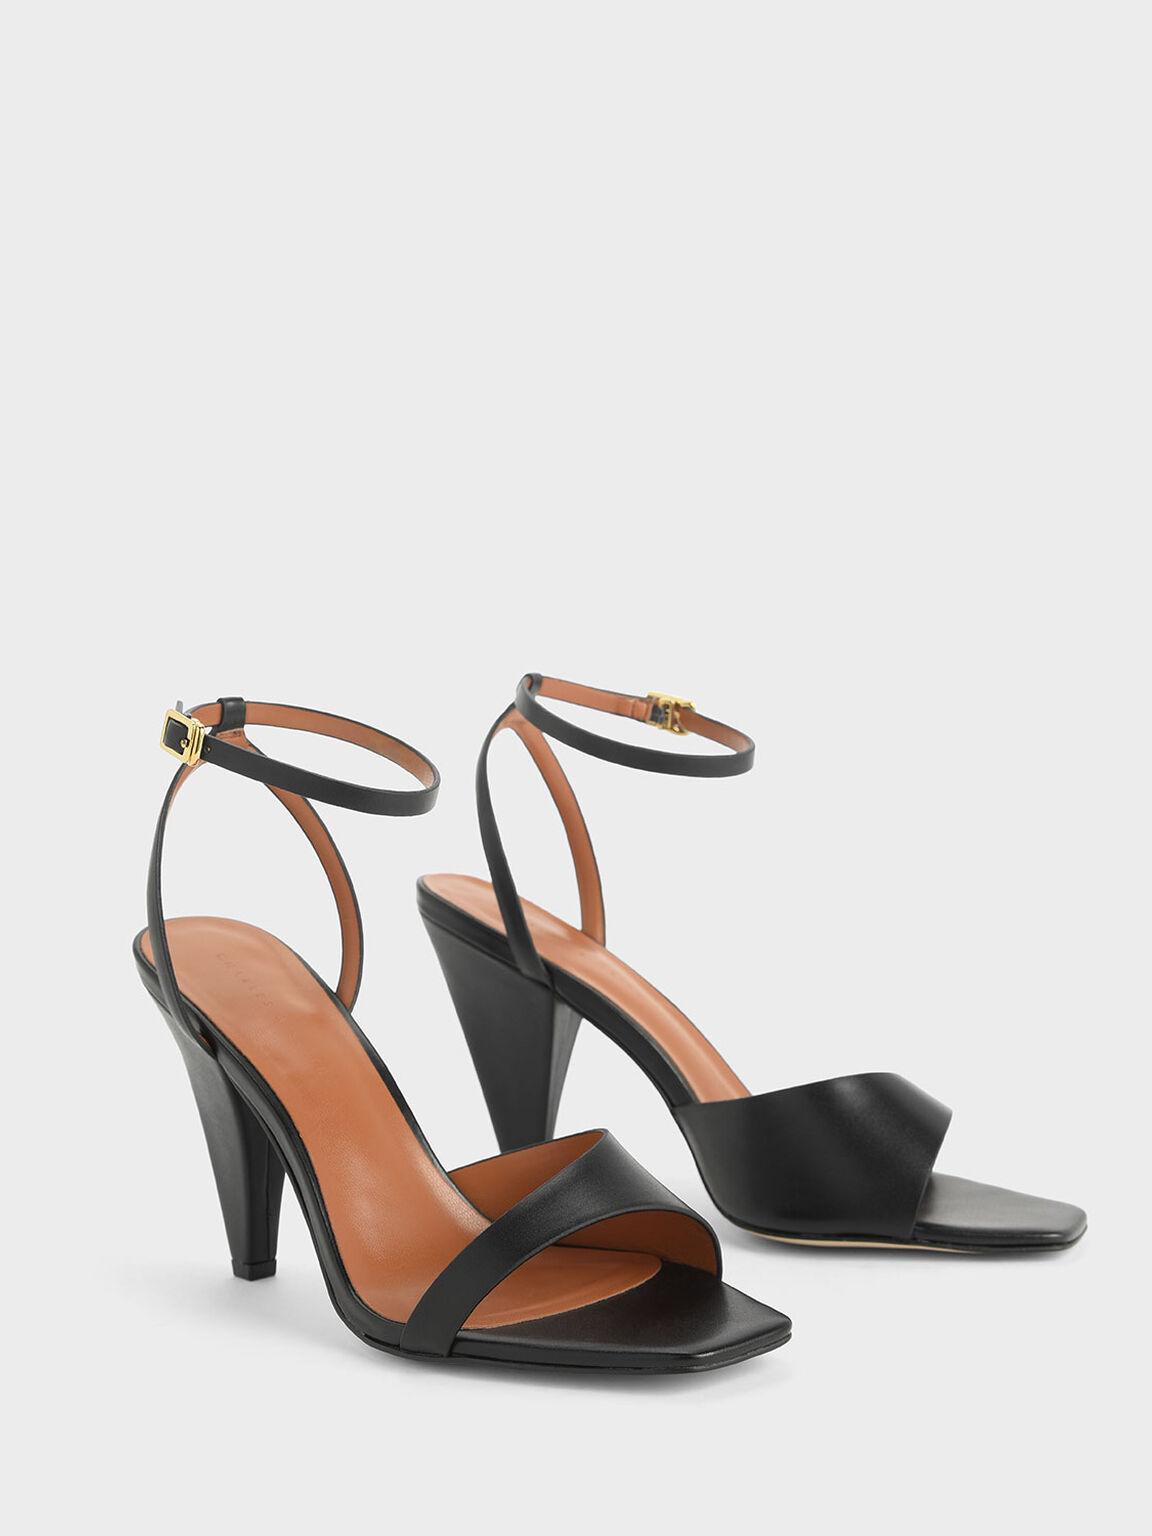 Asymmetric Strap Cone Heel Sandals, Black, hi-res